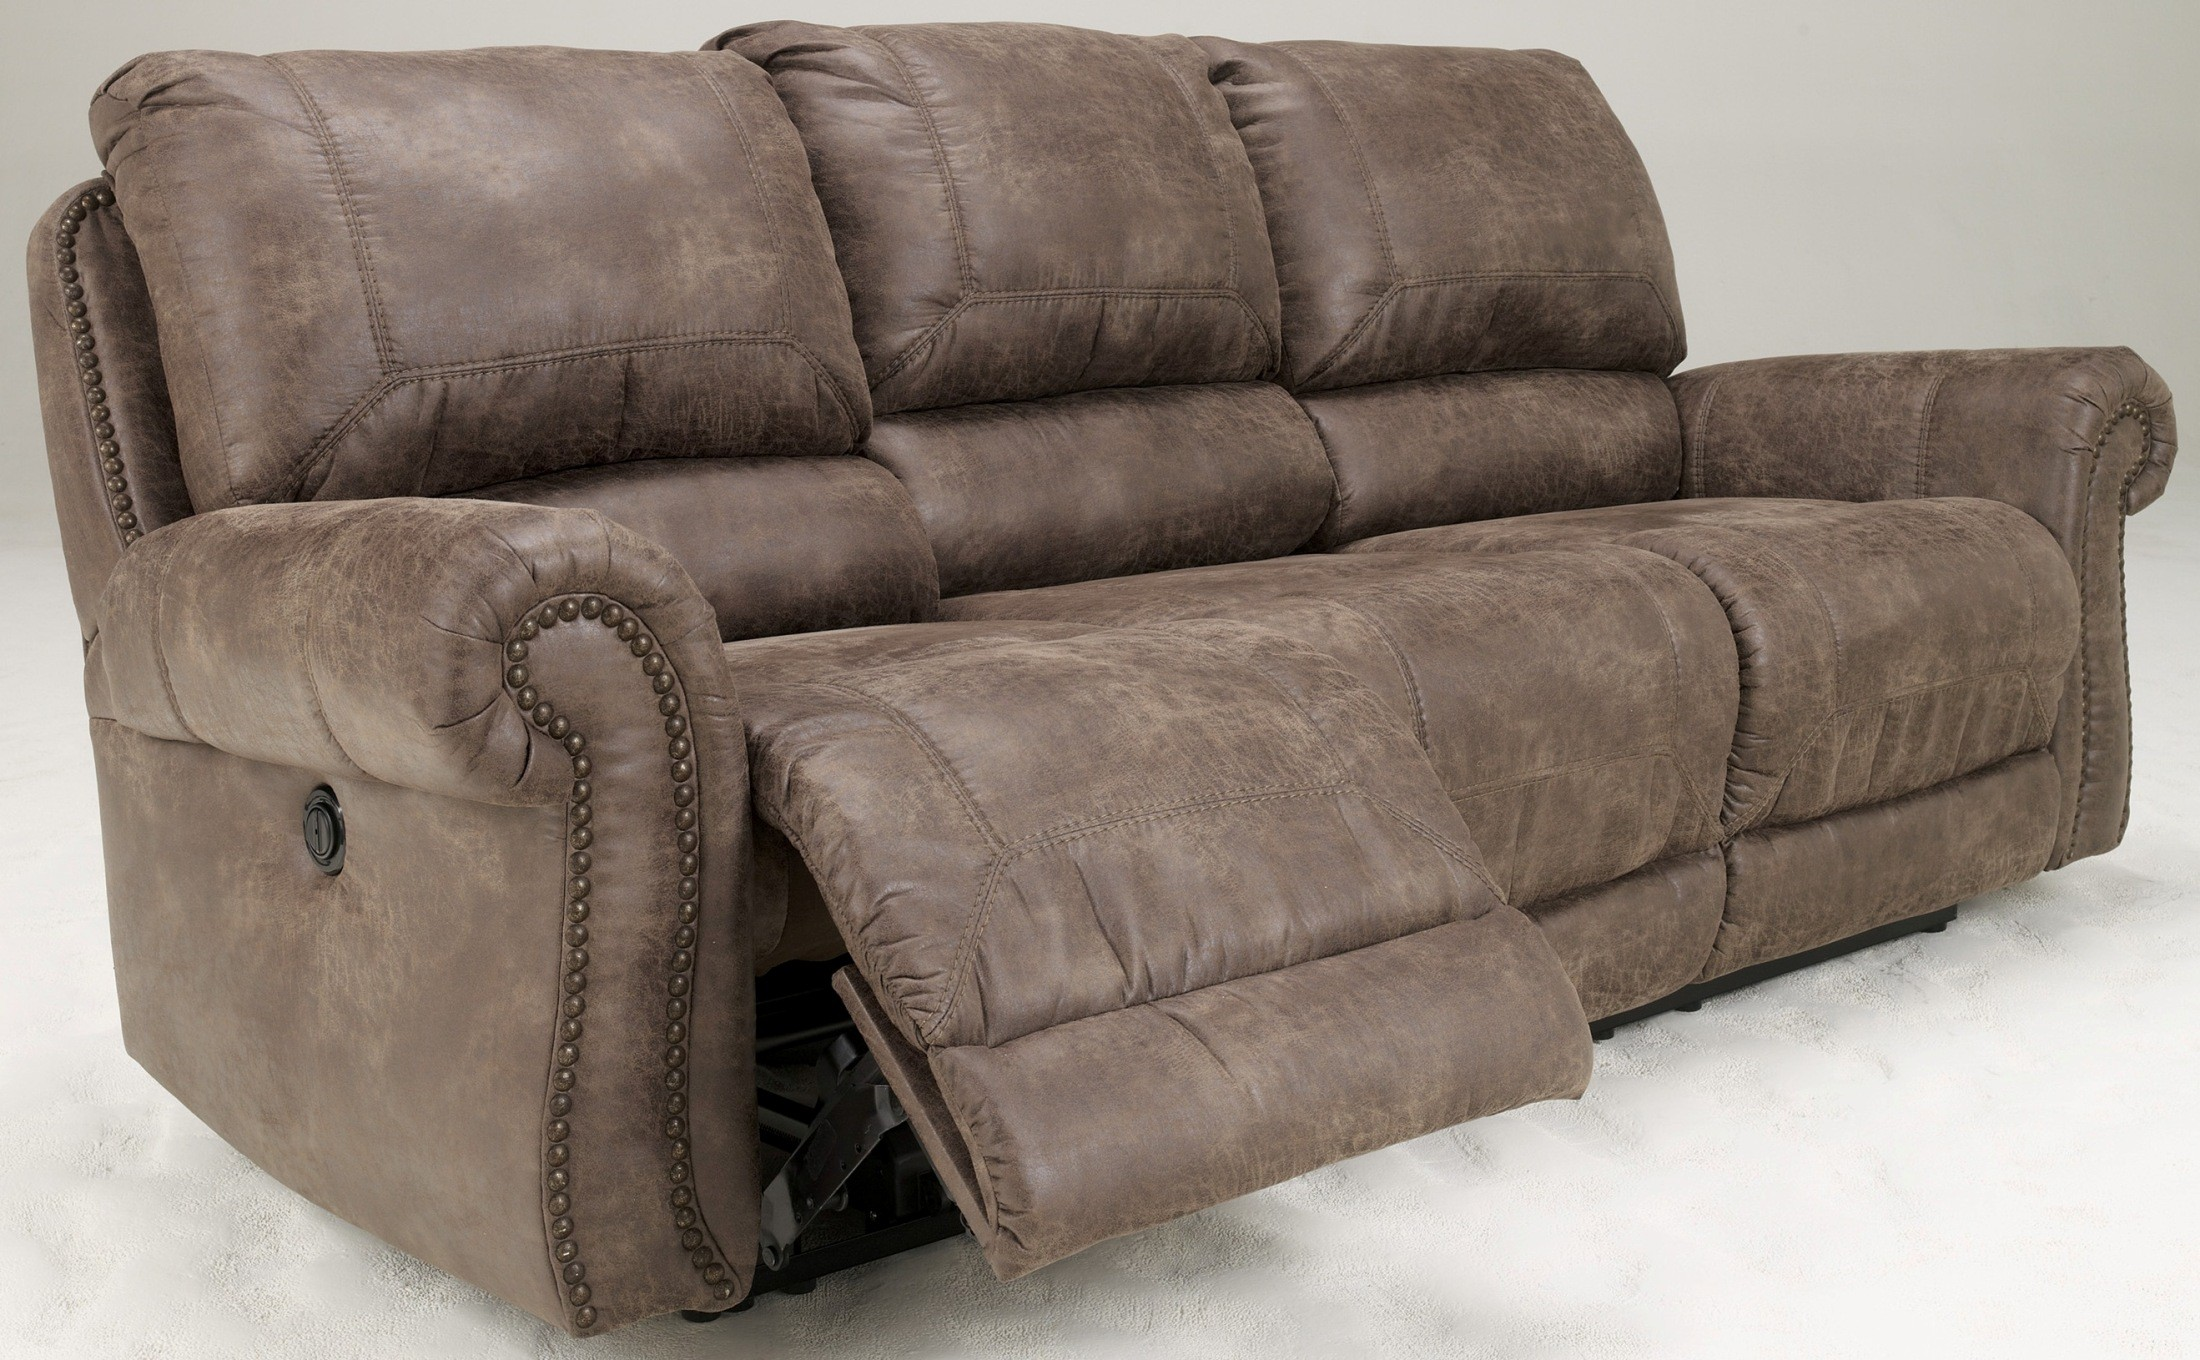 ashley sofa recliner parts bad credit rating oberson gunsmoke power reclining from 7410087